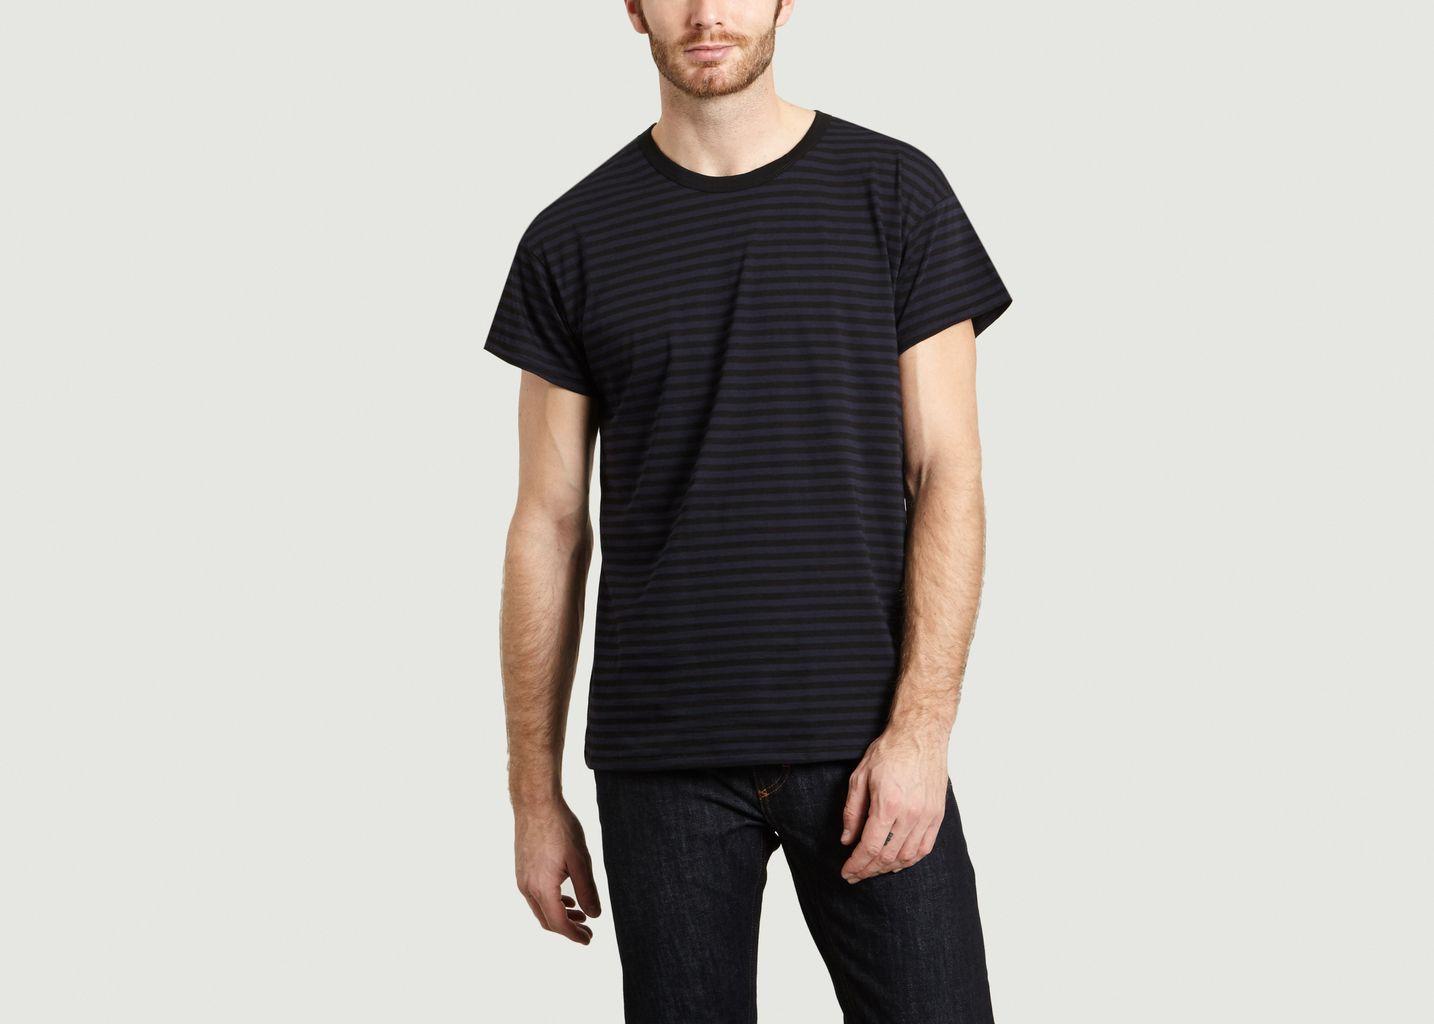 T-Shirt Sunset Stripe - The White Briefs